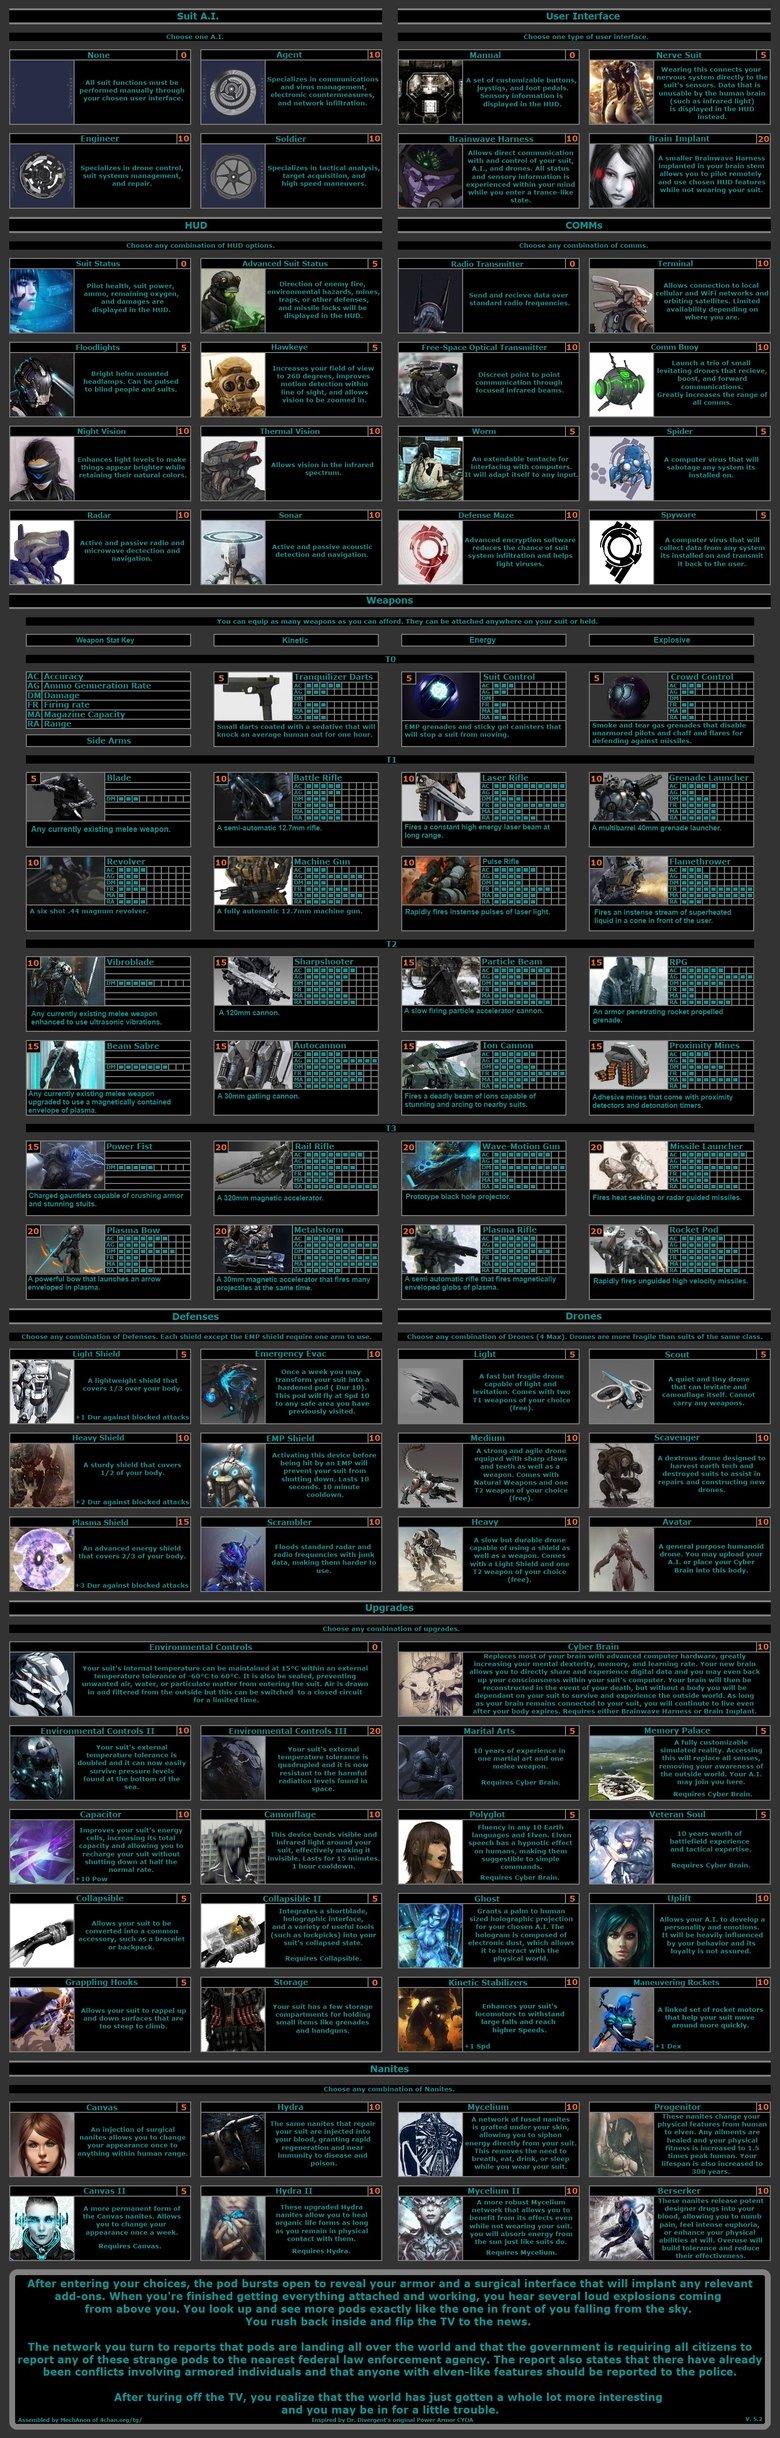 Choose Your Own Armor. .. Class: Heavy Stats: Dex: 6 Dur: 1 Pow: 4 Rec: 2 Spd: 7 Str: 4 Sexy+Avian AI: Soldier Interface: Nerve Suit Hud: Status, Hawkeye, Sonar COMMs: Radio, Worm, Termi